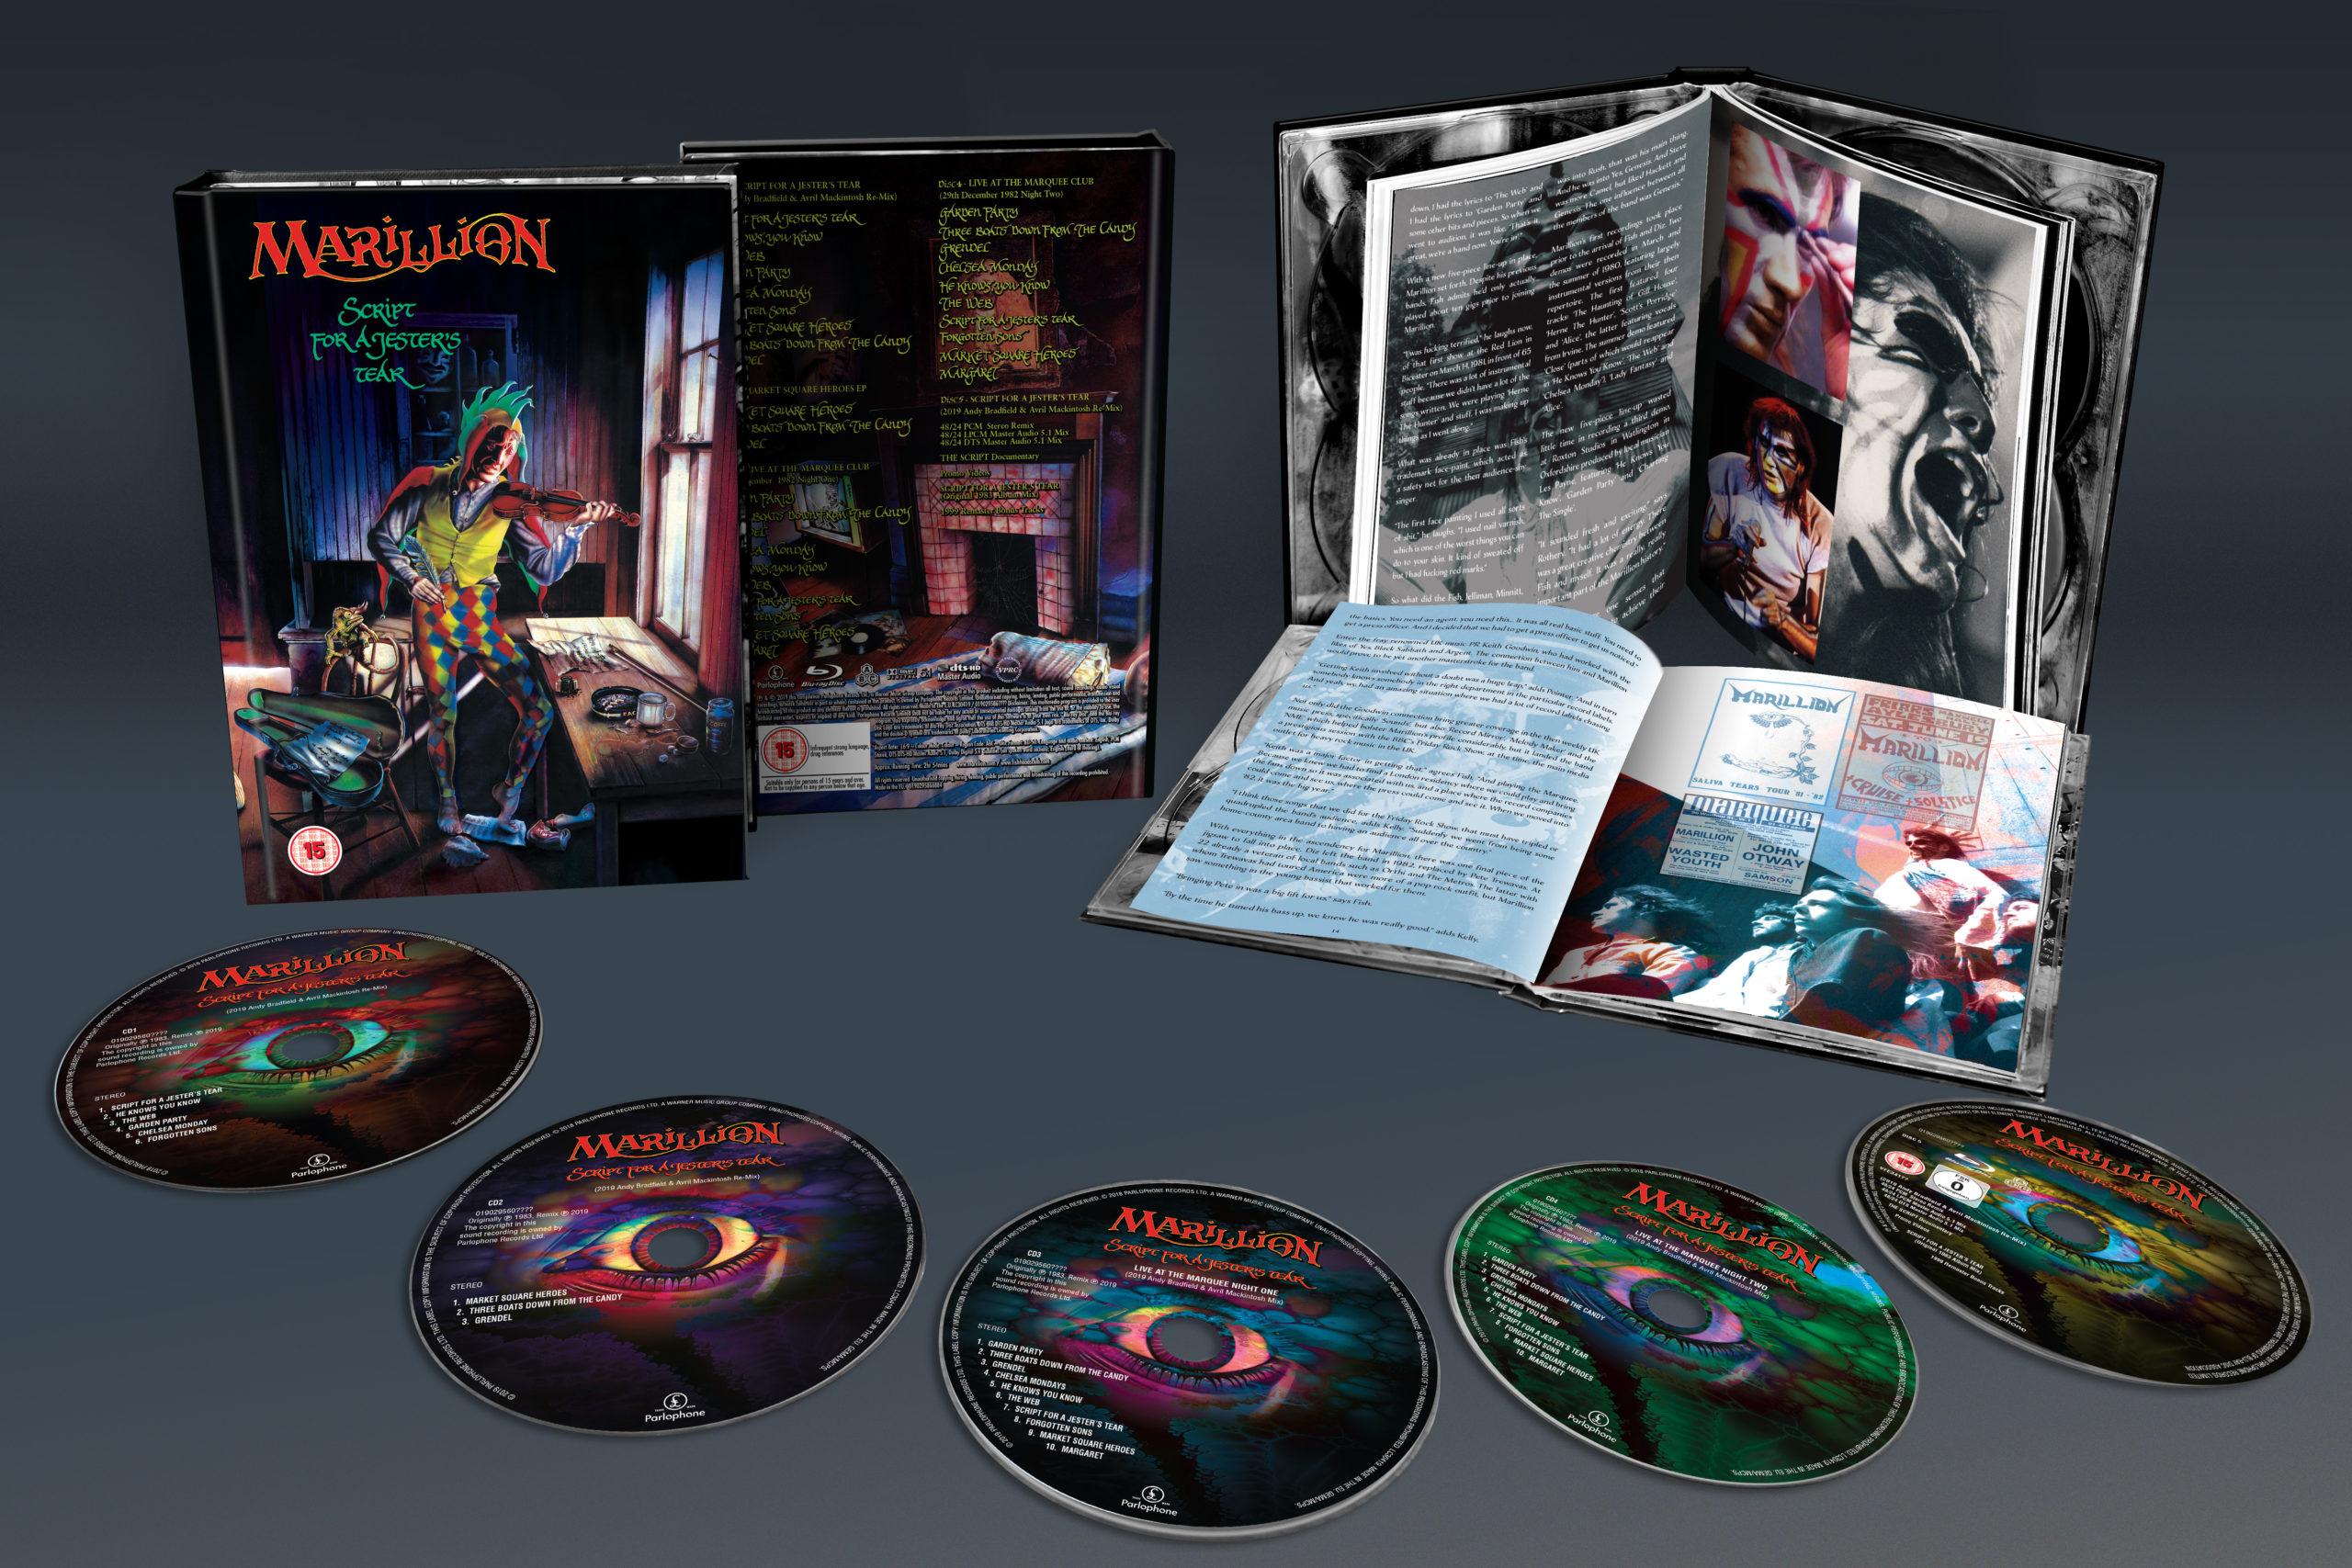 Marillion / Script For A Jester's Tear 4CD+blu-ray reissue